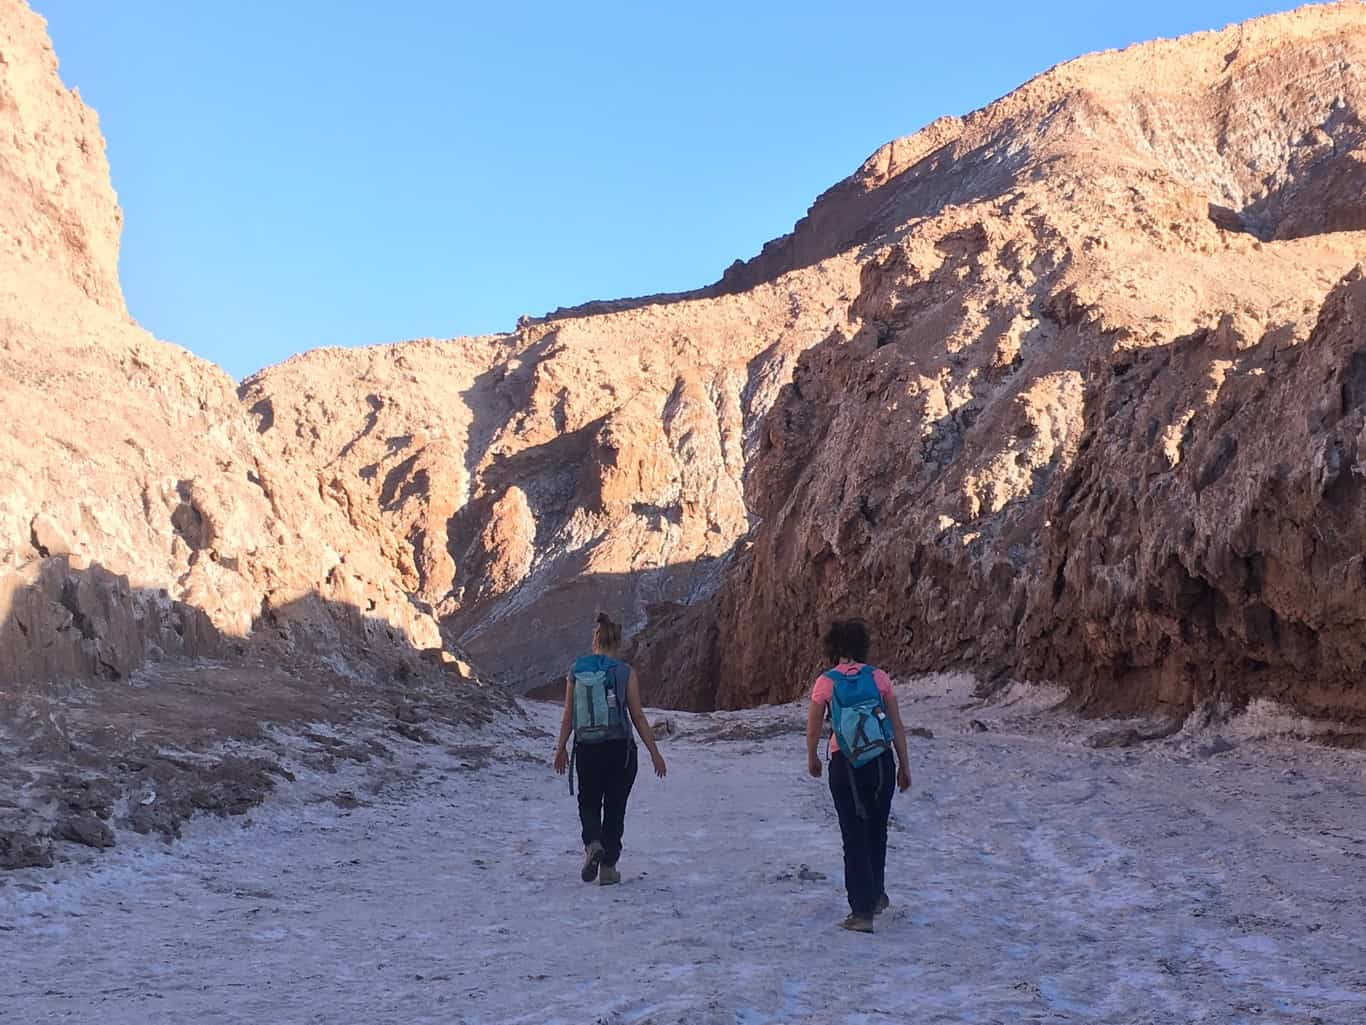 Day 1 - Moon Valley - Ckari Gorge Hike